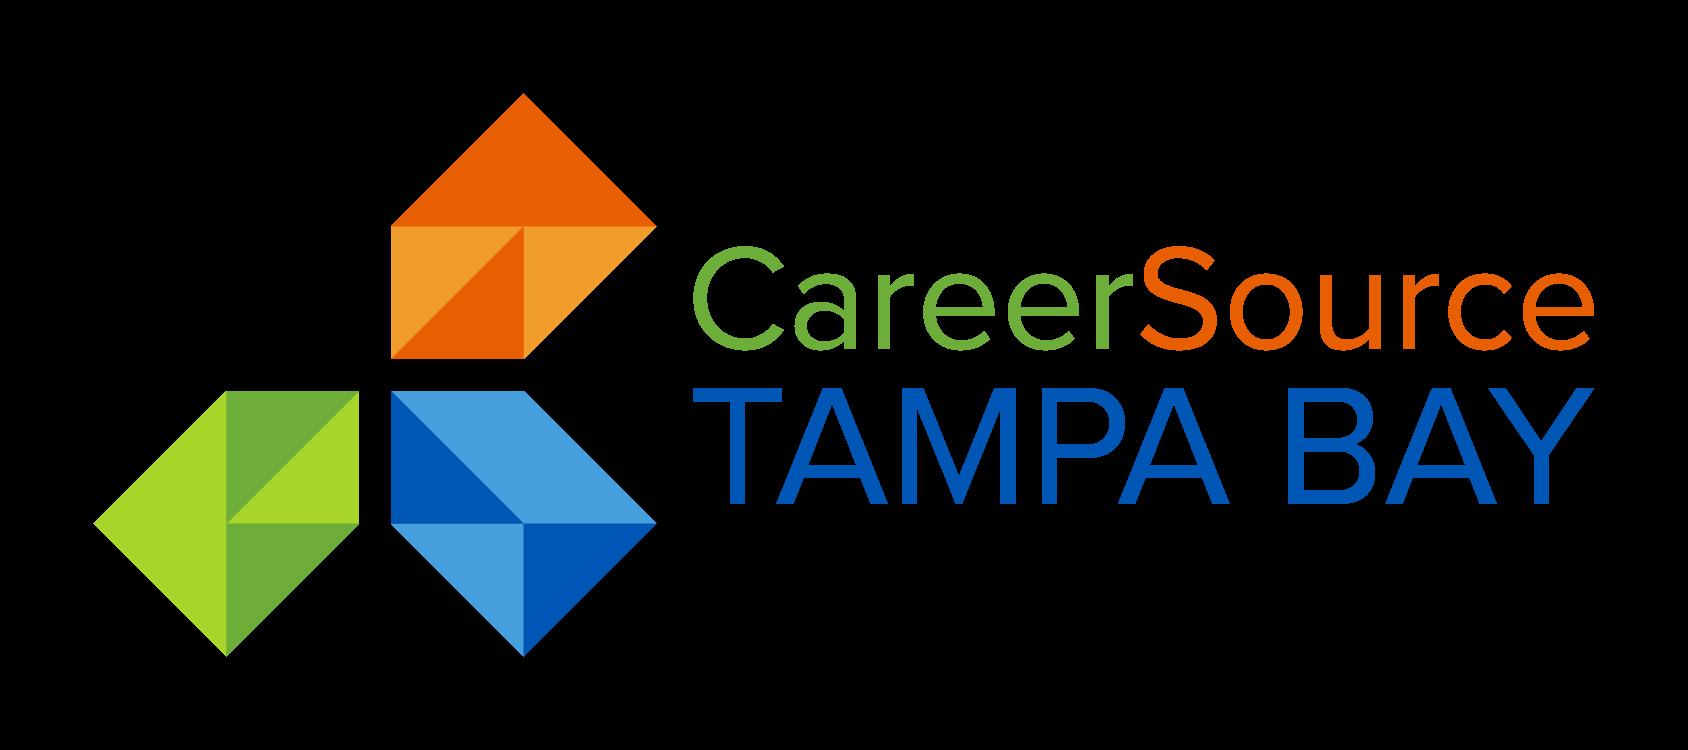 CareerSource Tampa Bay Logo